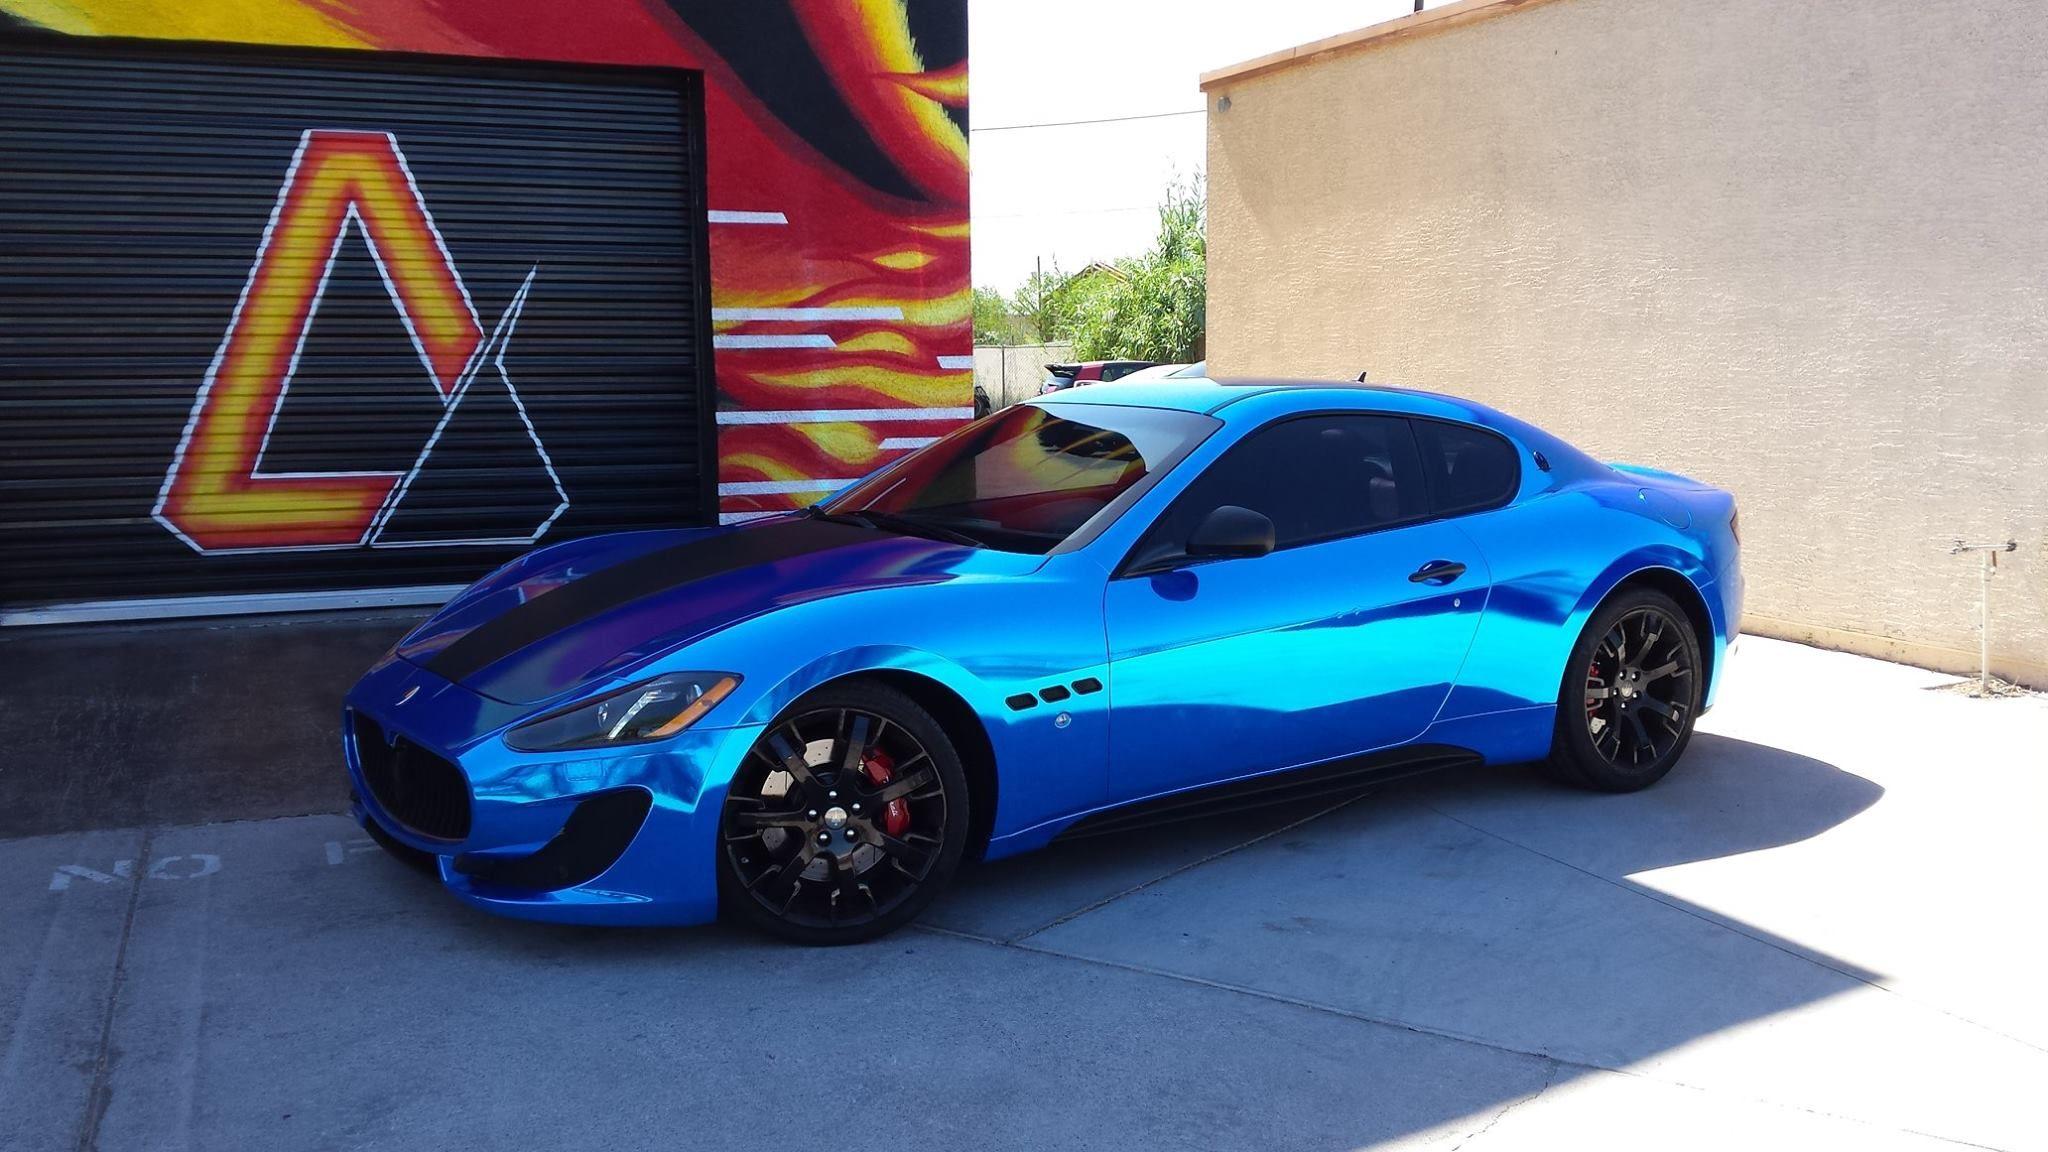 Maserati Gran Turismo Sport Avery Blue Chrome W Carbon Fiber Hood Matte Black Handles Side Mirrors Side Skir Maserati Vinyl Wrap Car Maserati Granturismo